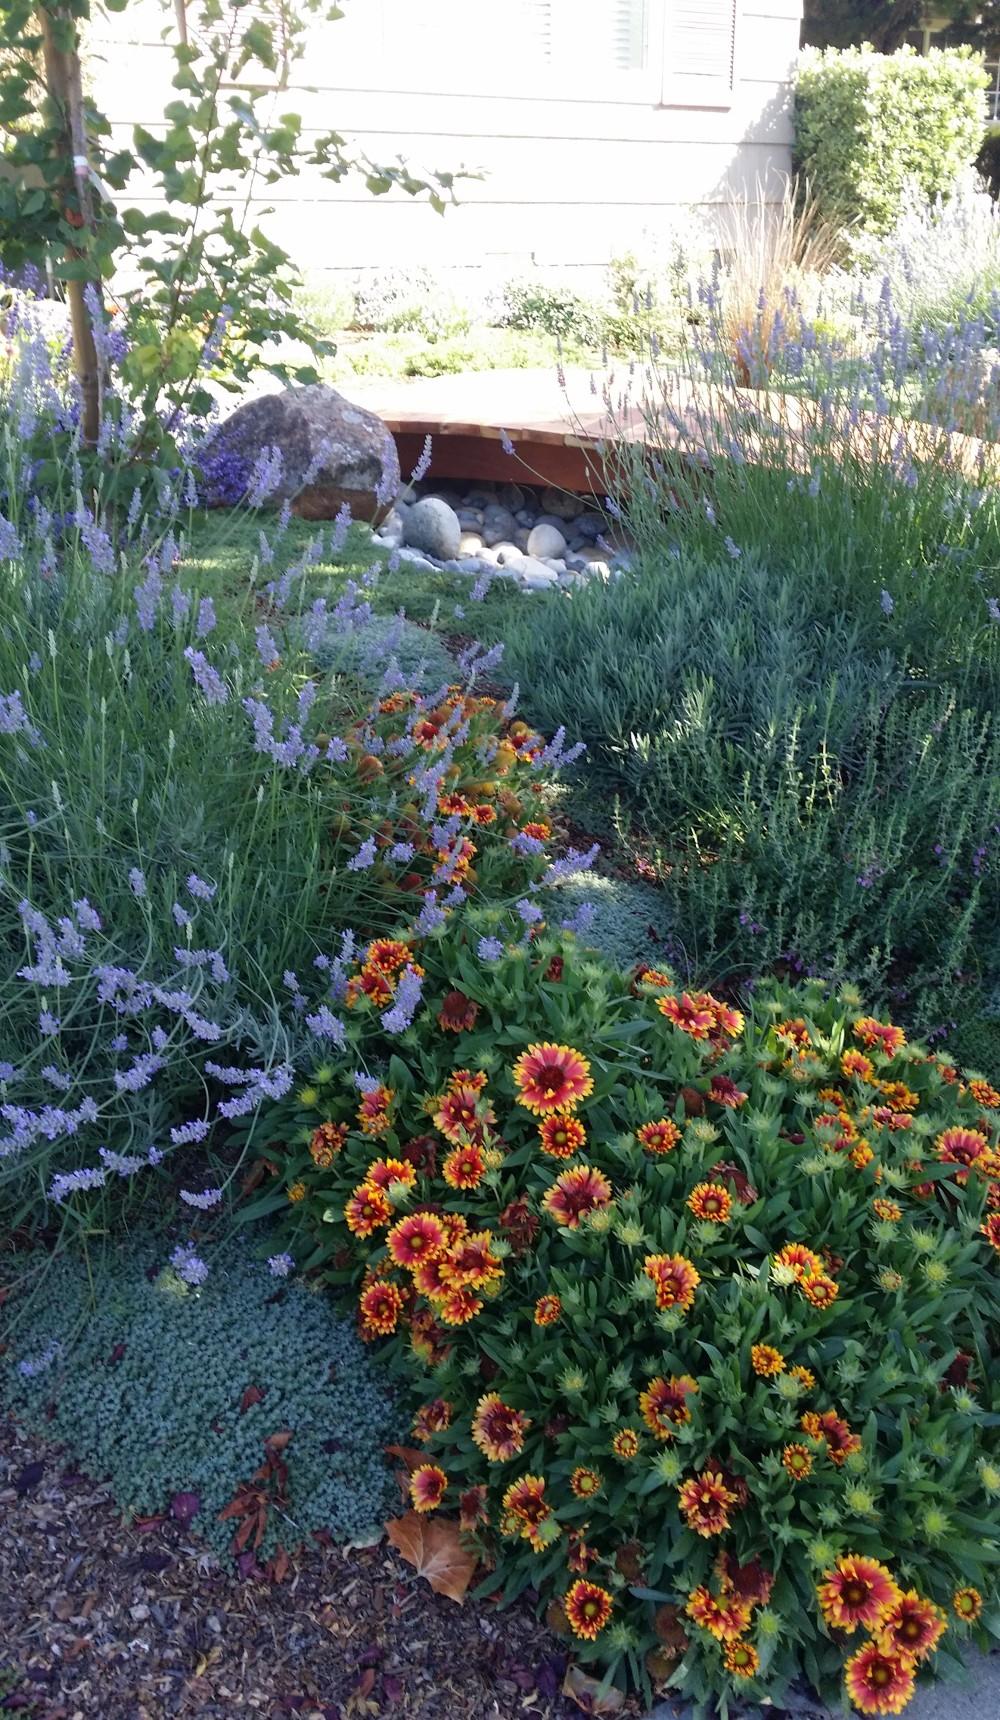 Landscape Rebate Garden San Jose CA Dry Creek and Lavender Apricot Germander Gaillardia